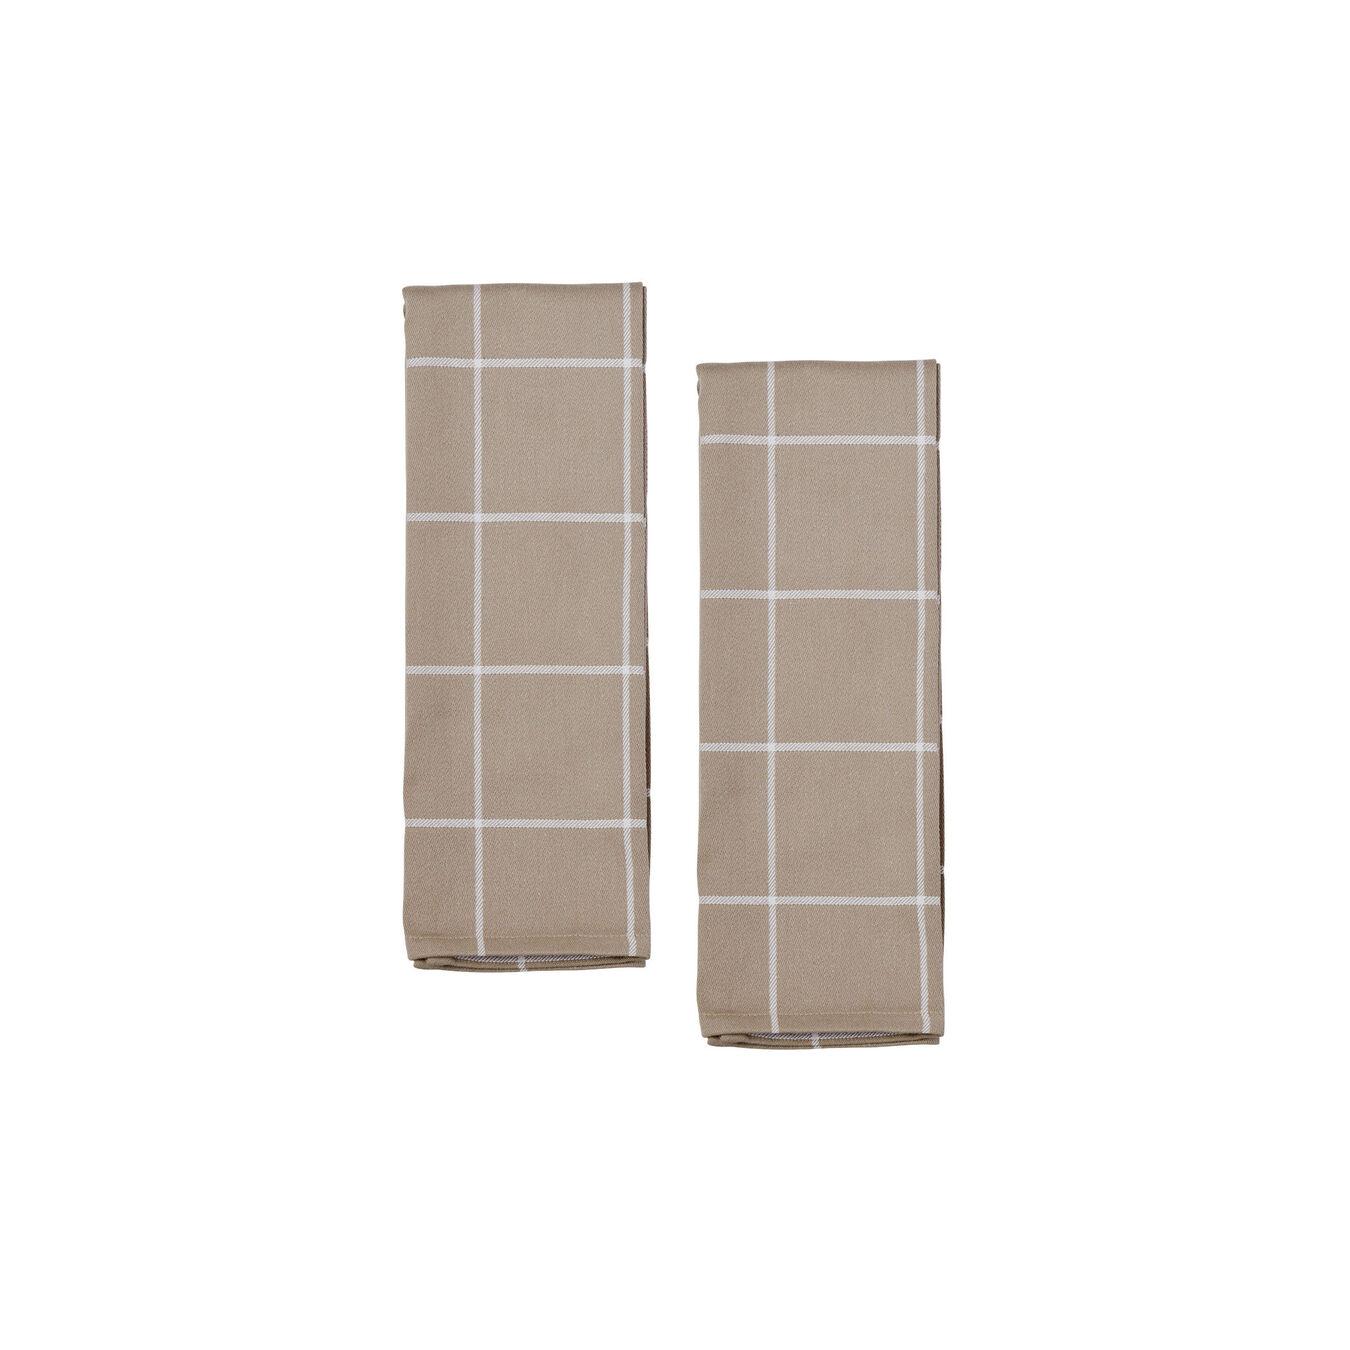 4-pc Kitchen Towel Set - Taupe,,large 3